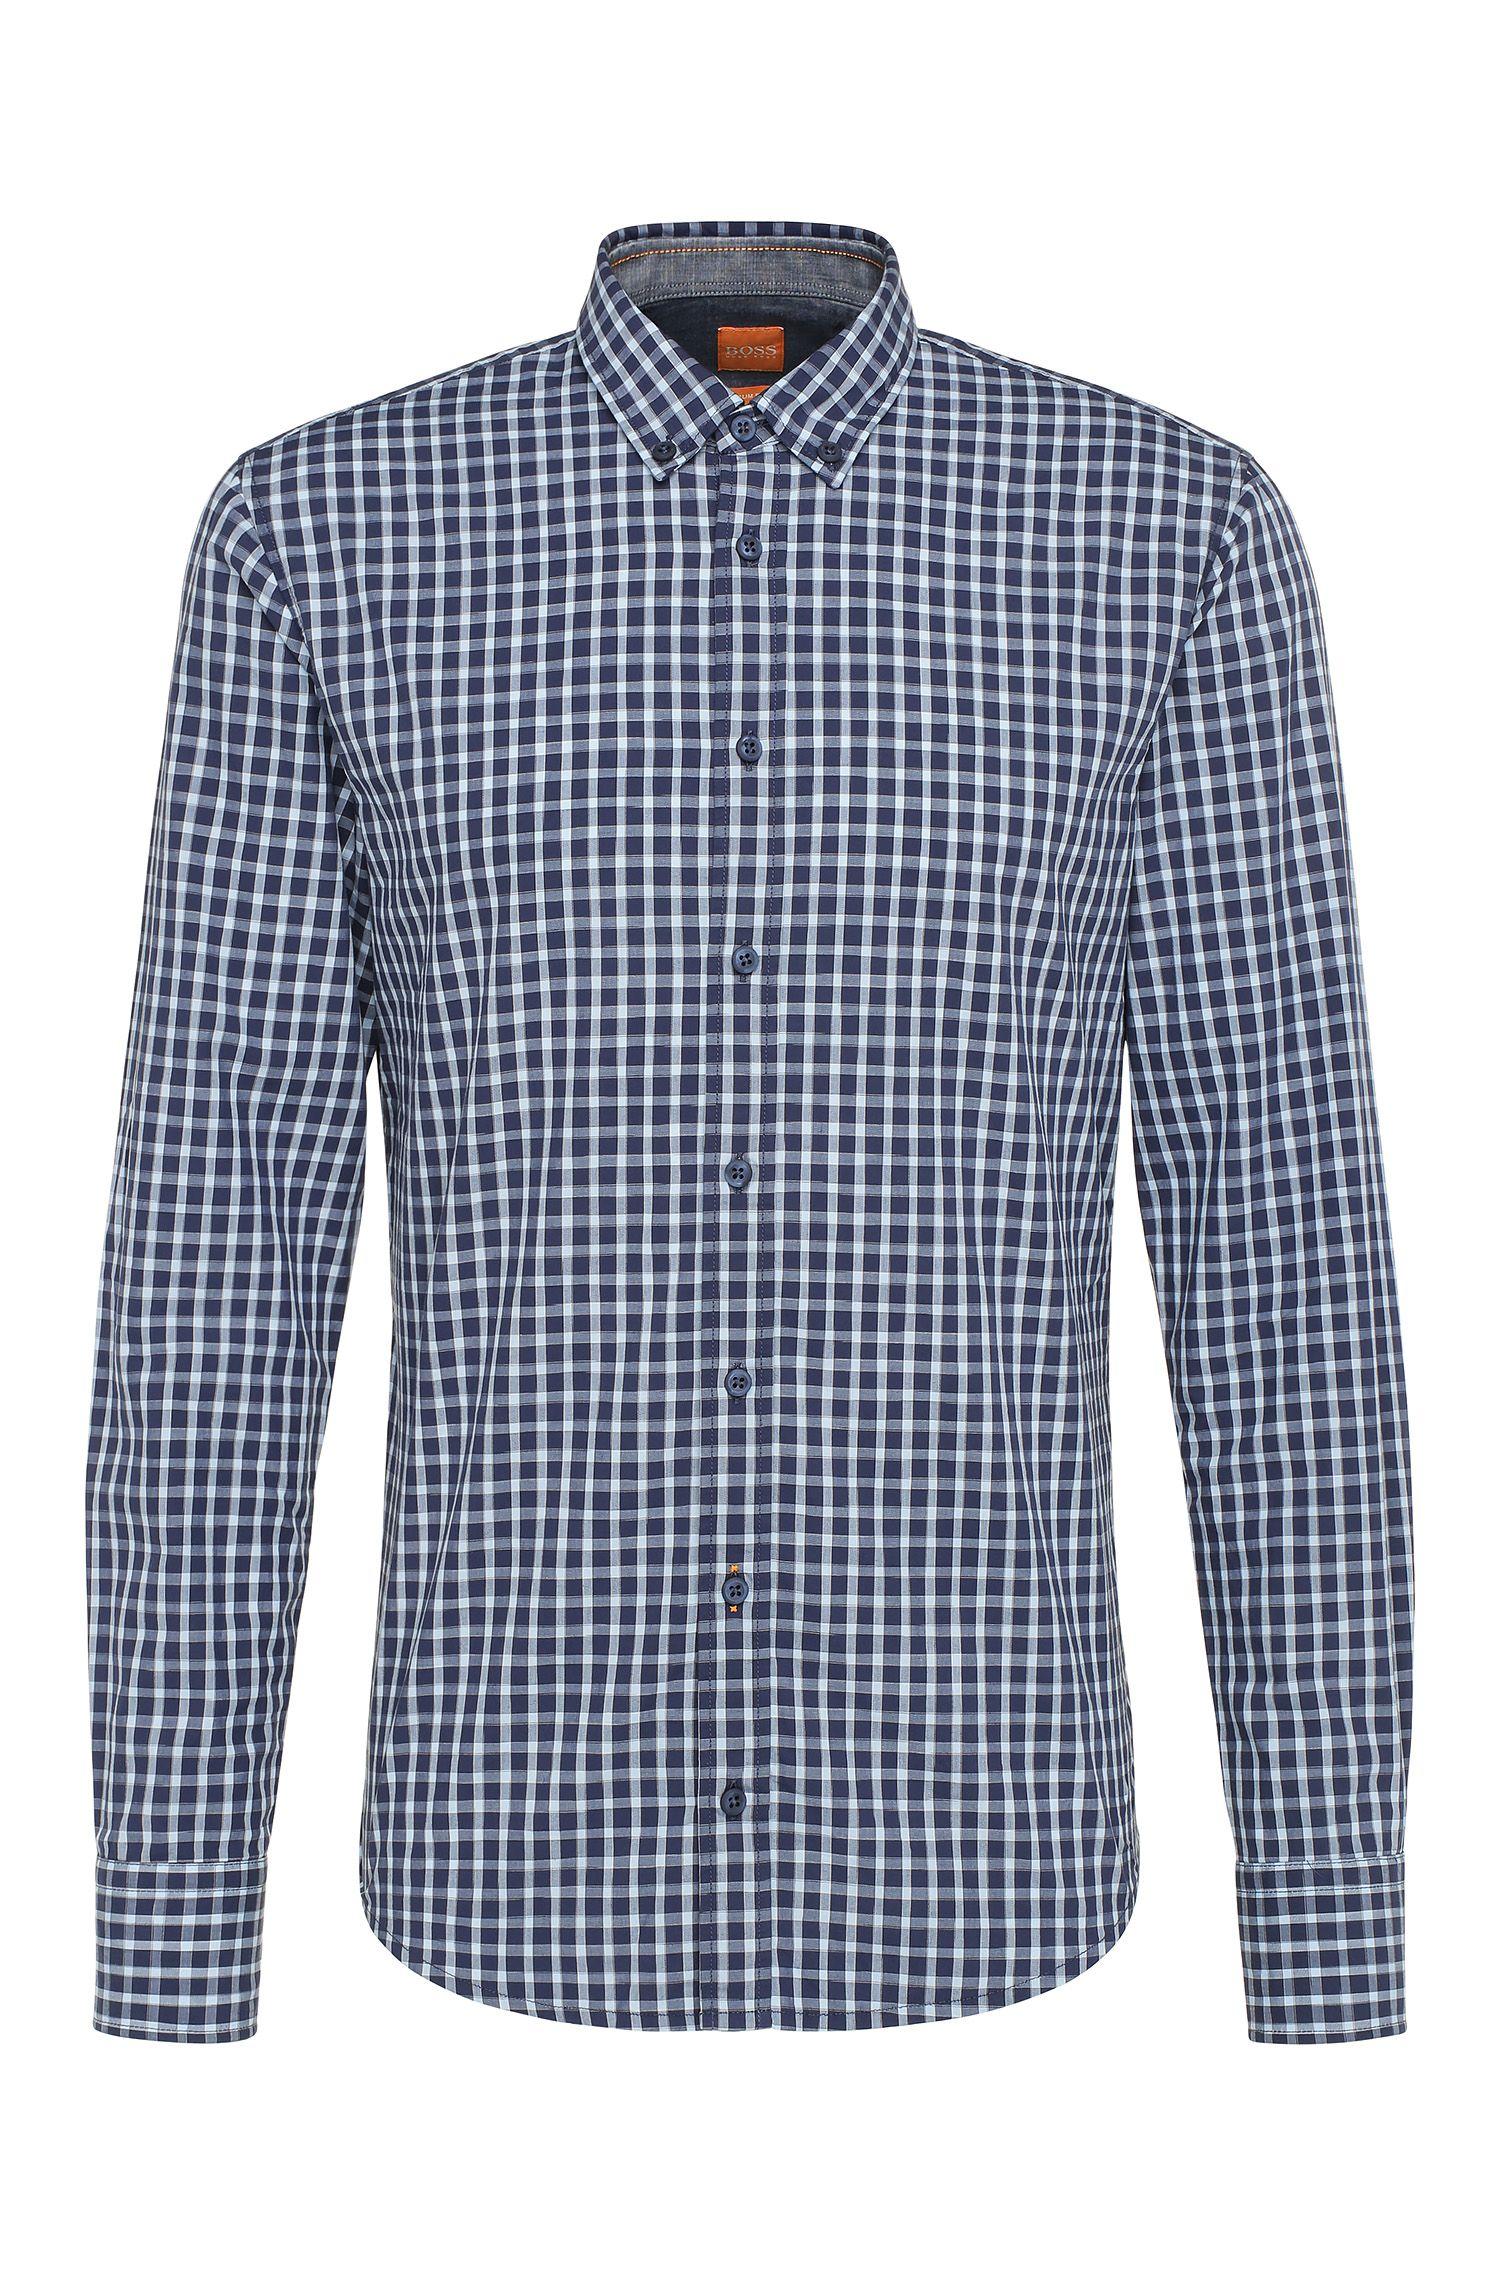 'EdipoE'   Slim Fit, Cotton Plaid Button Down Shirt